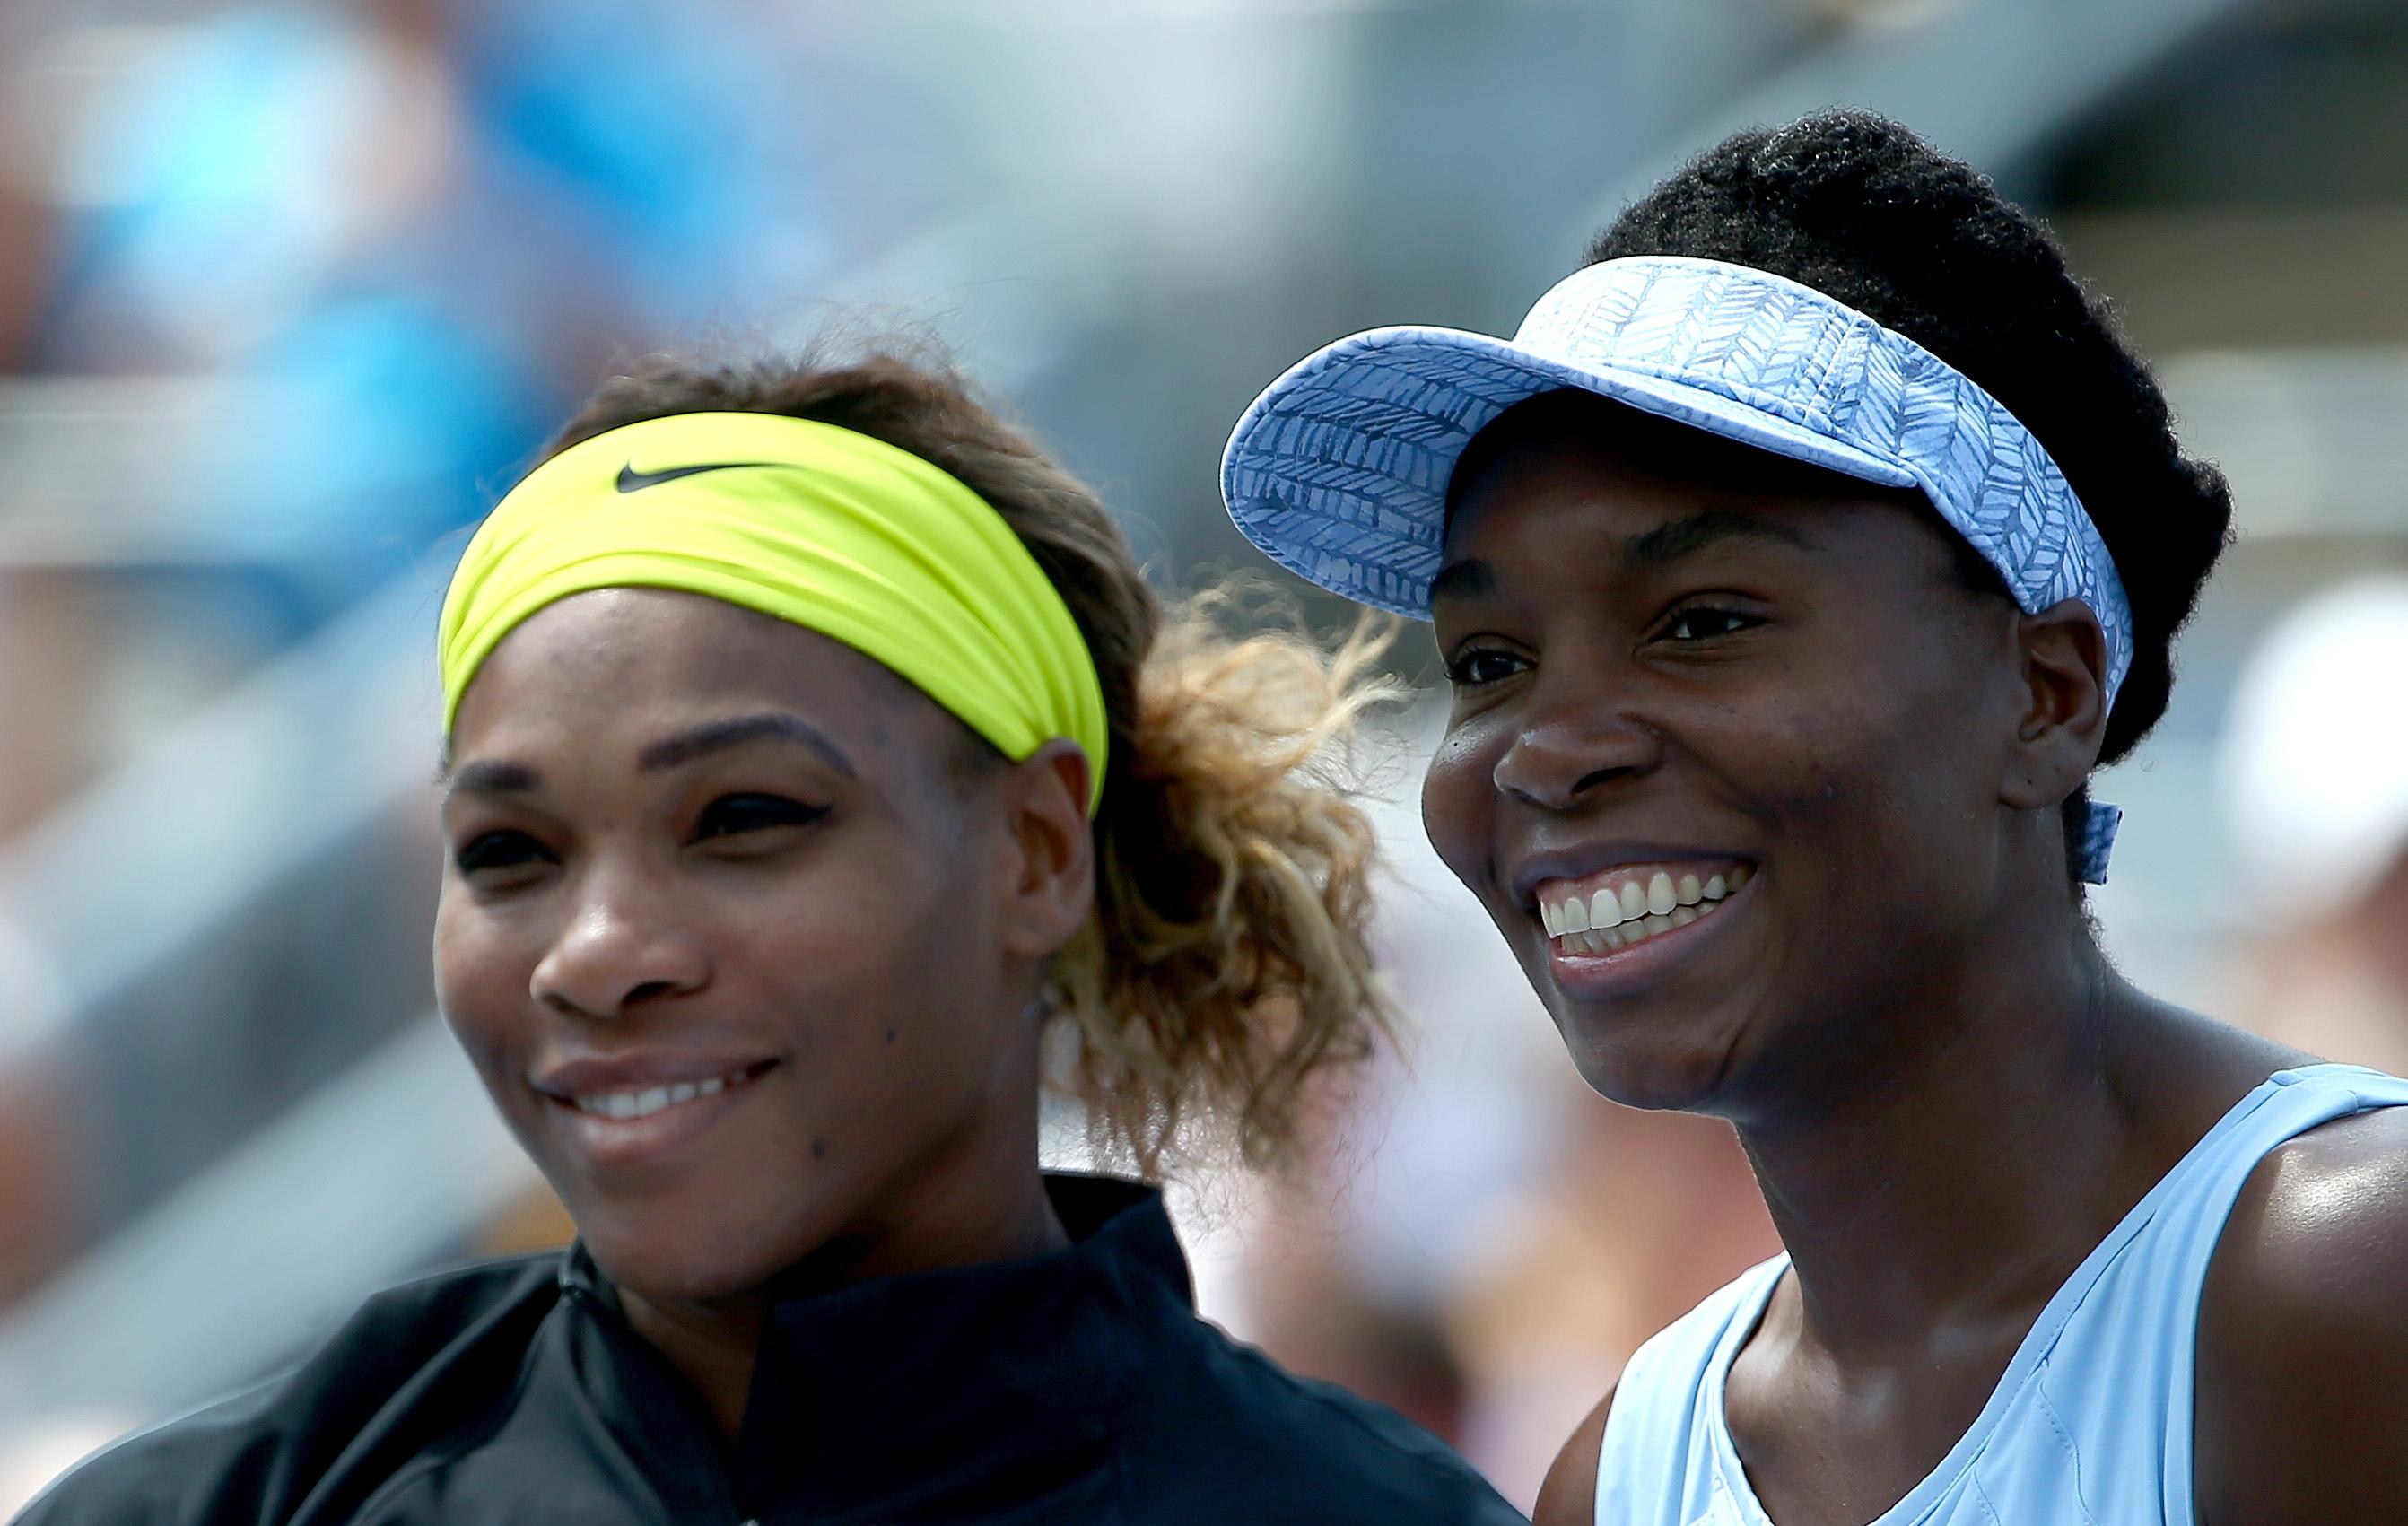 US Open 2015, Serena Williams vs. Venus Williams: Time, TV schedule and live stream